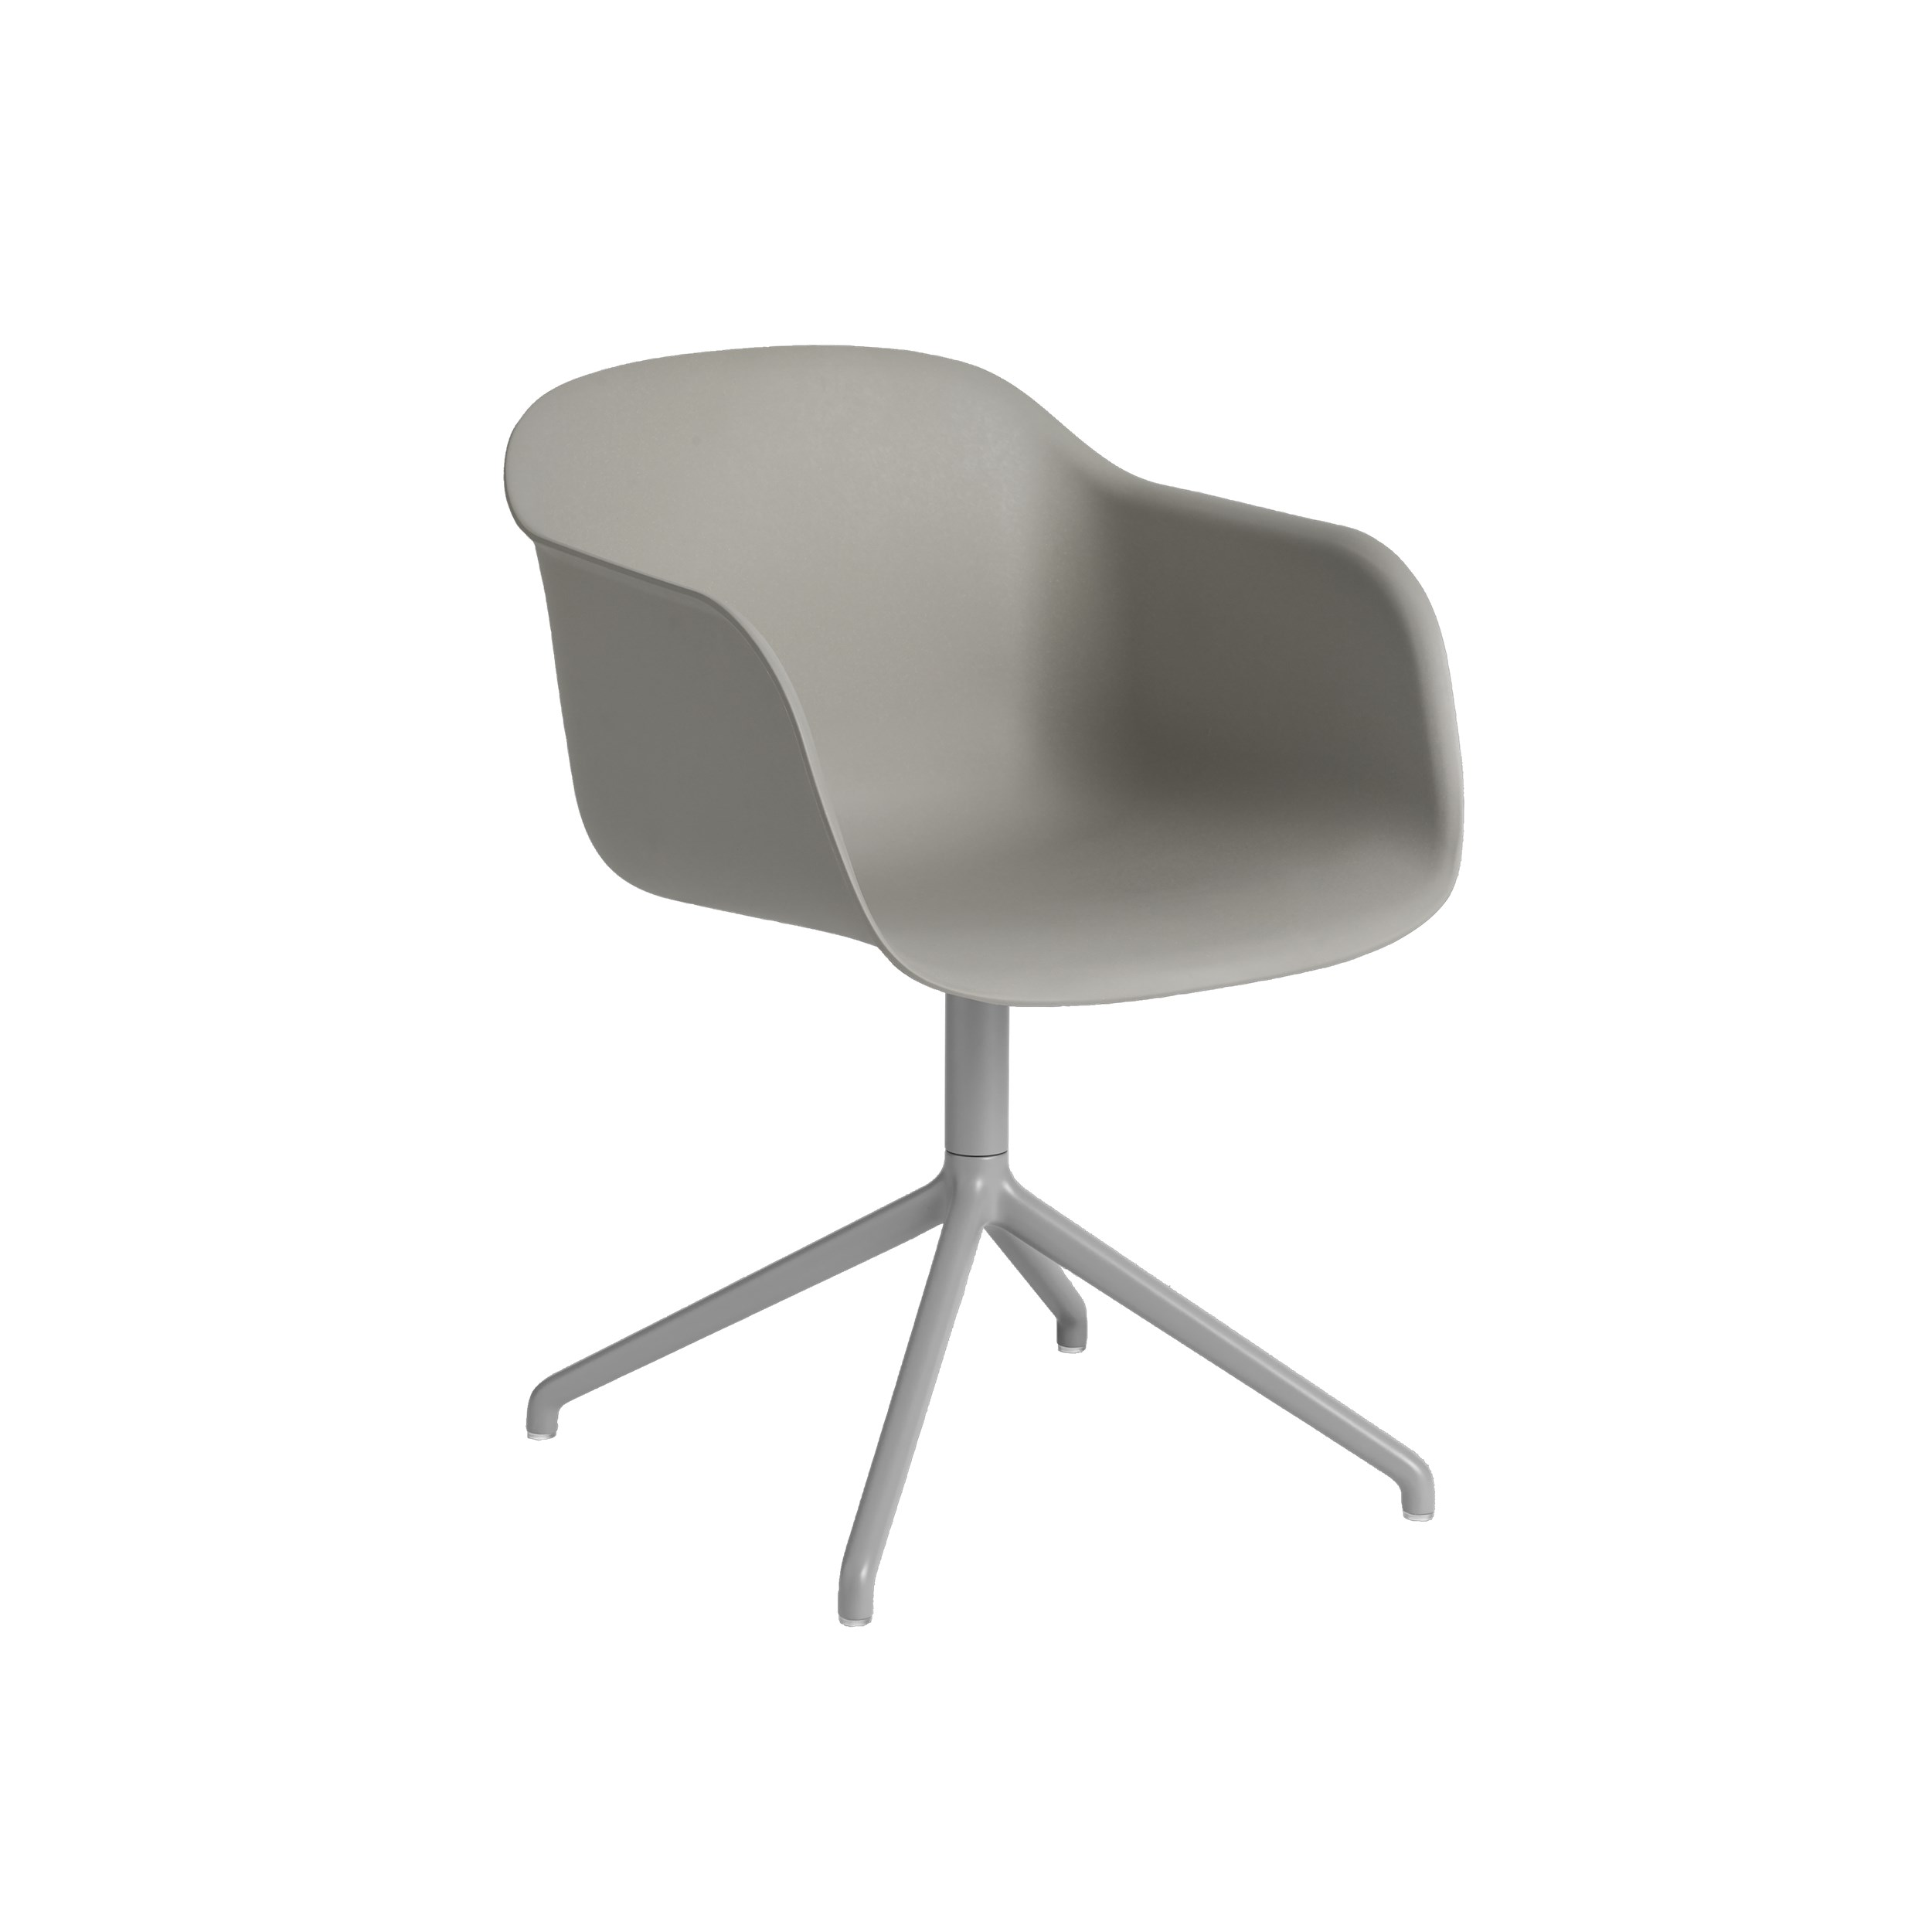 Fiber Swivel Chair in Shell